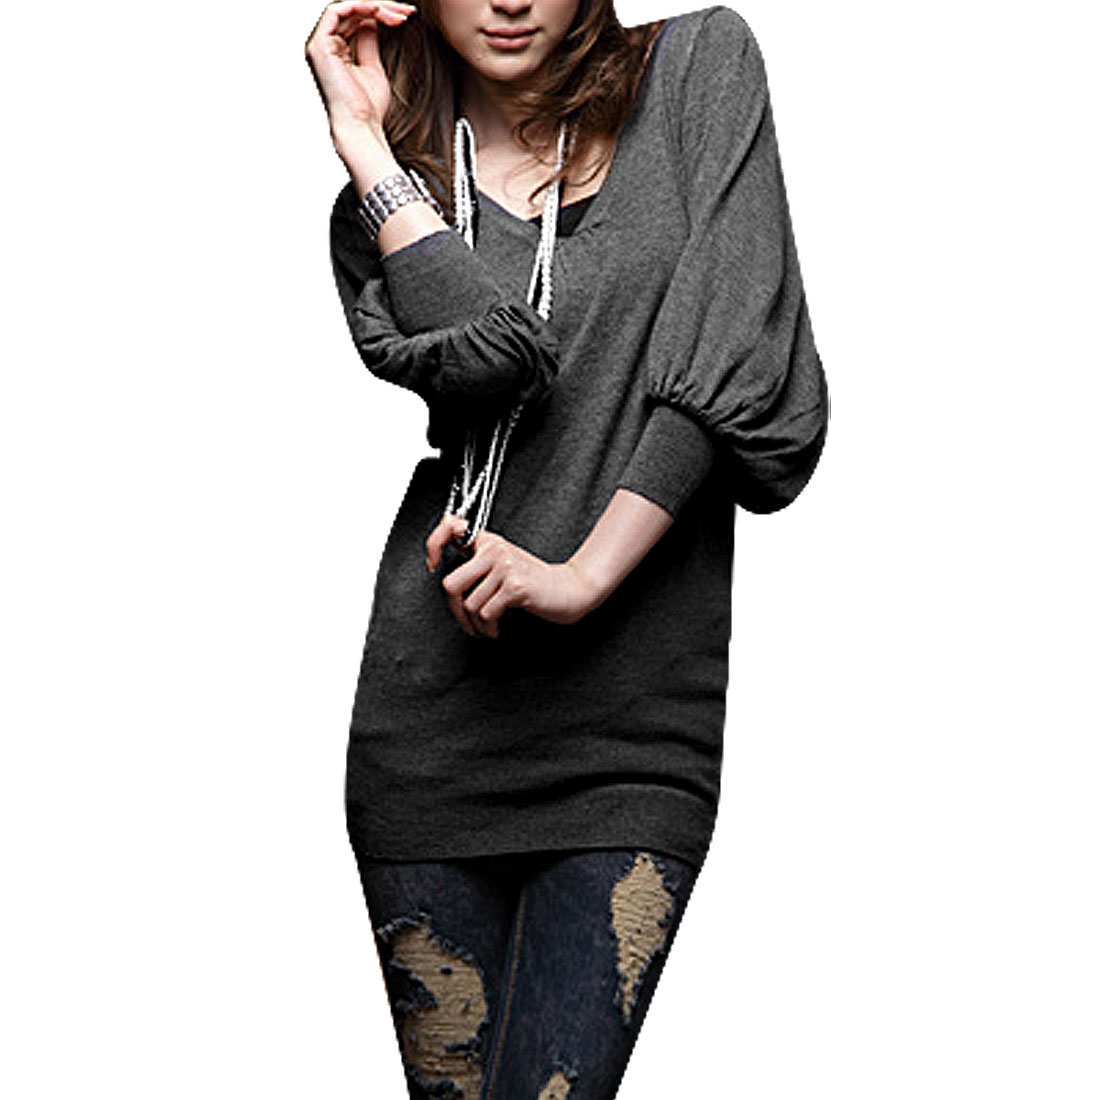 Lady Dark Gray Bishop 3/4 Sleeve V Neck Autumn T-shirt XS